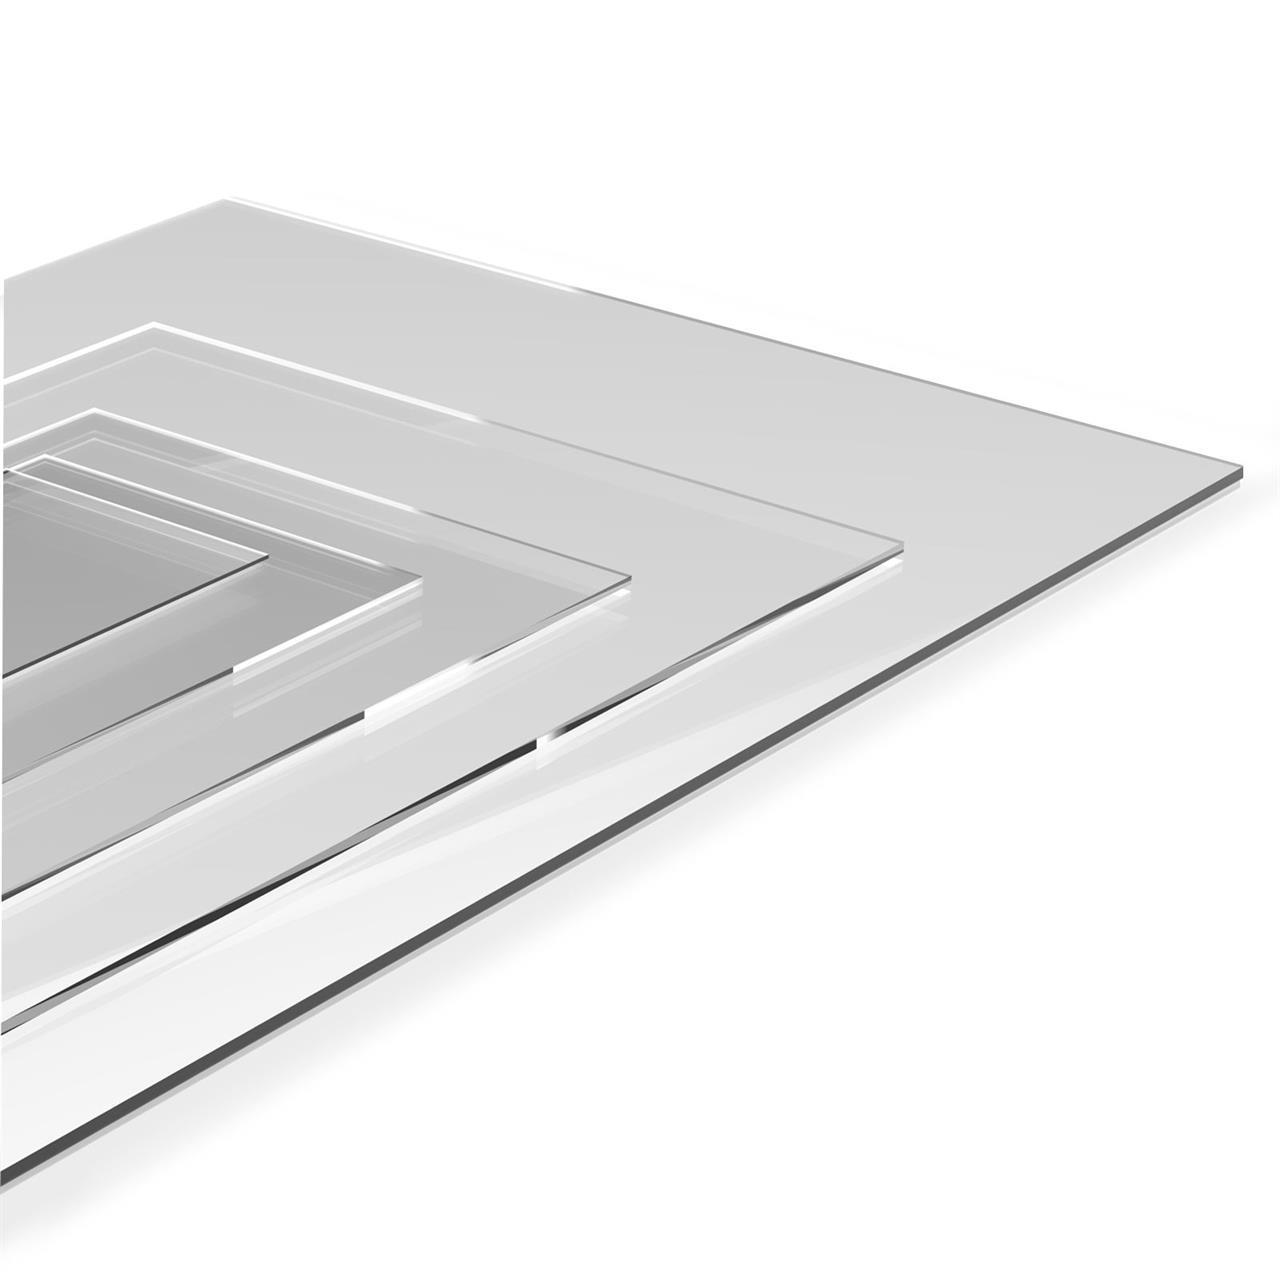 Plexiglasplattor202103